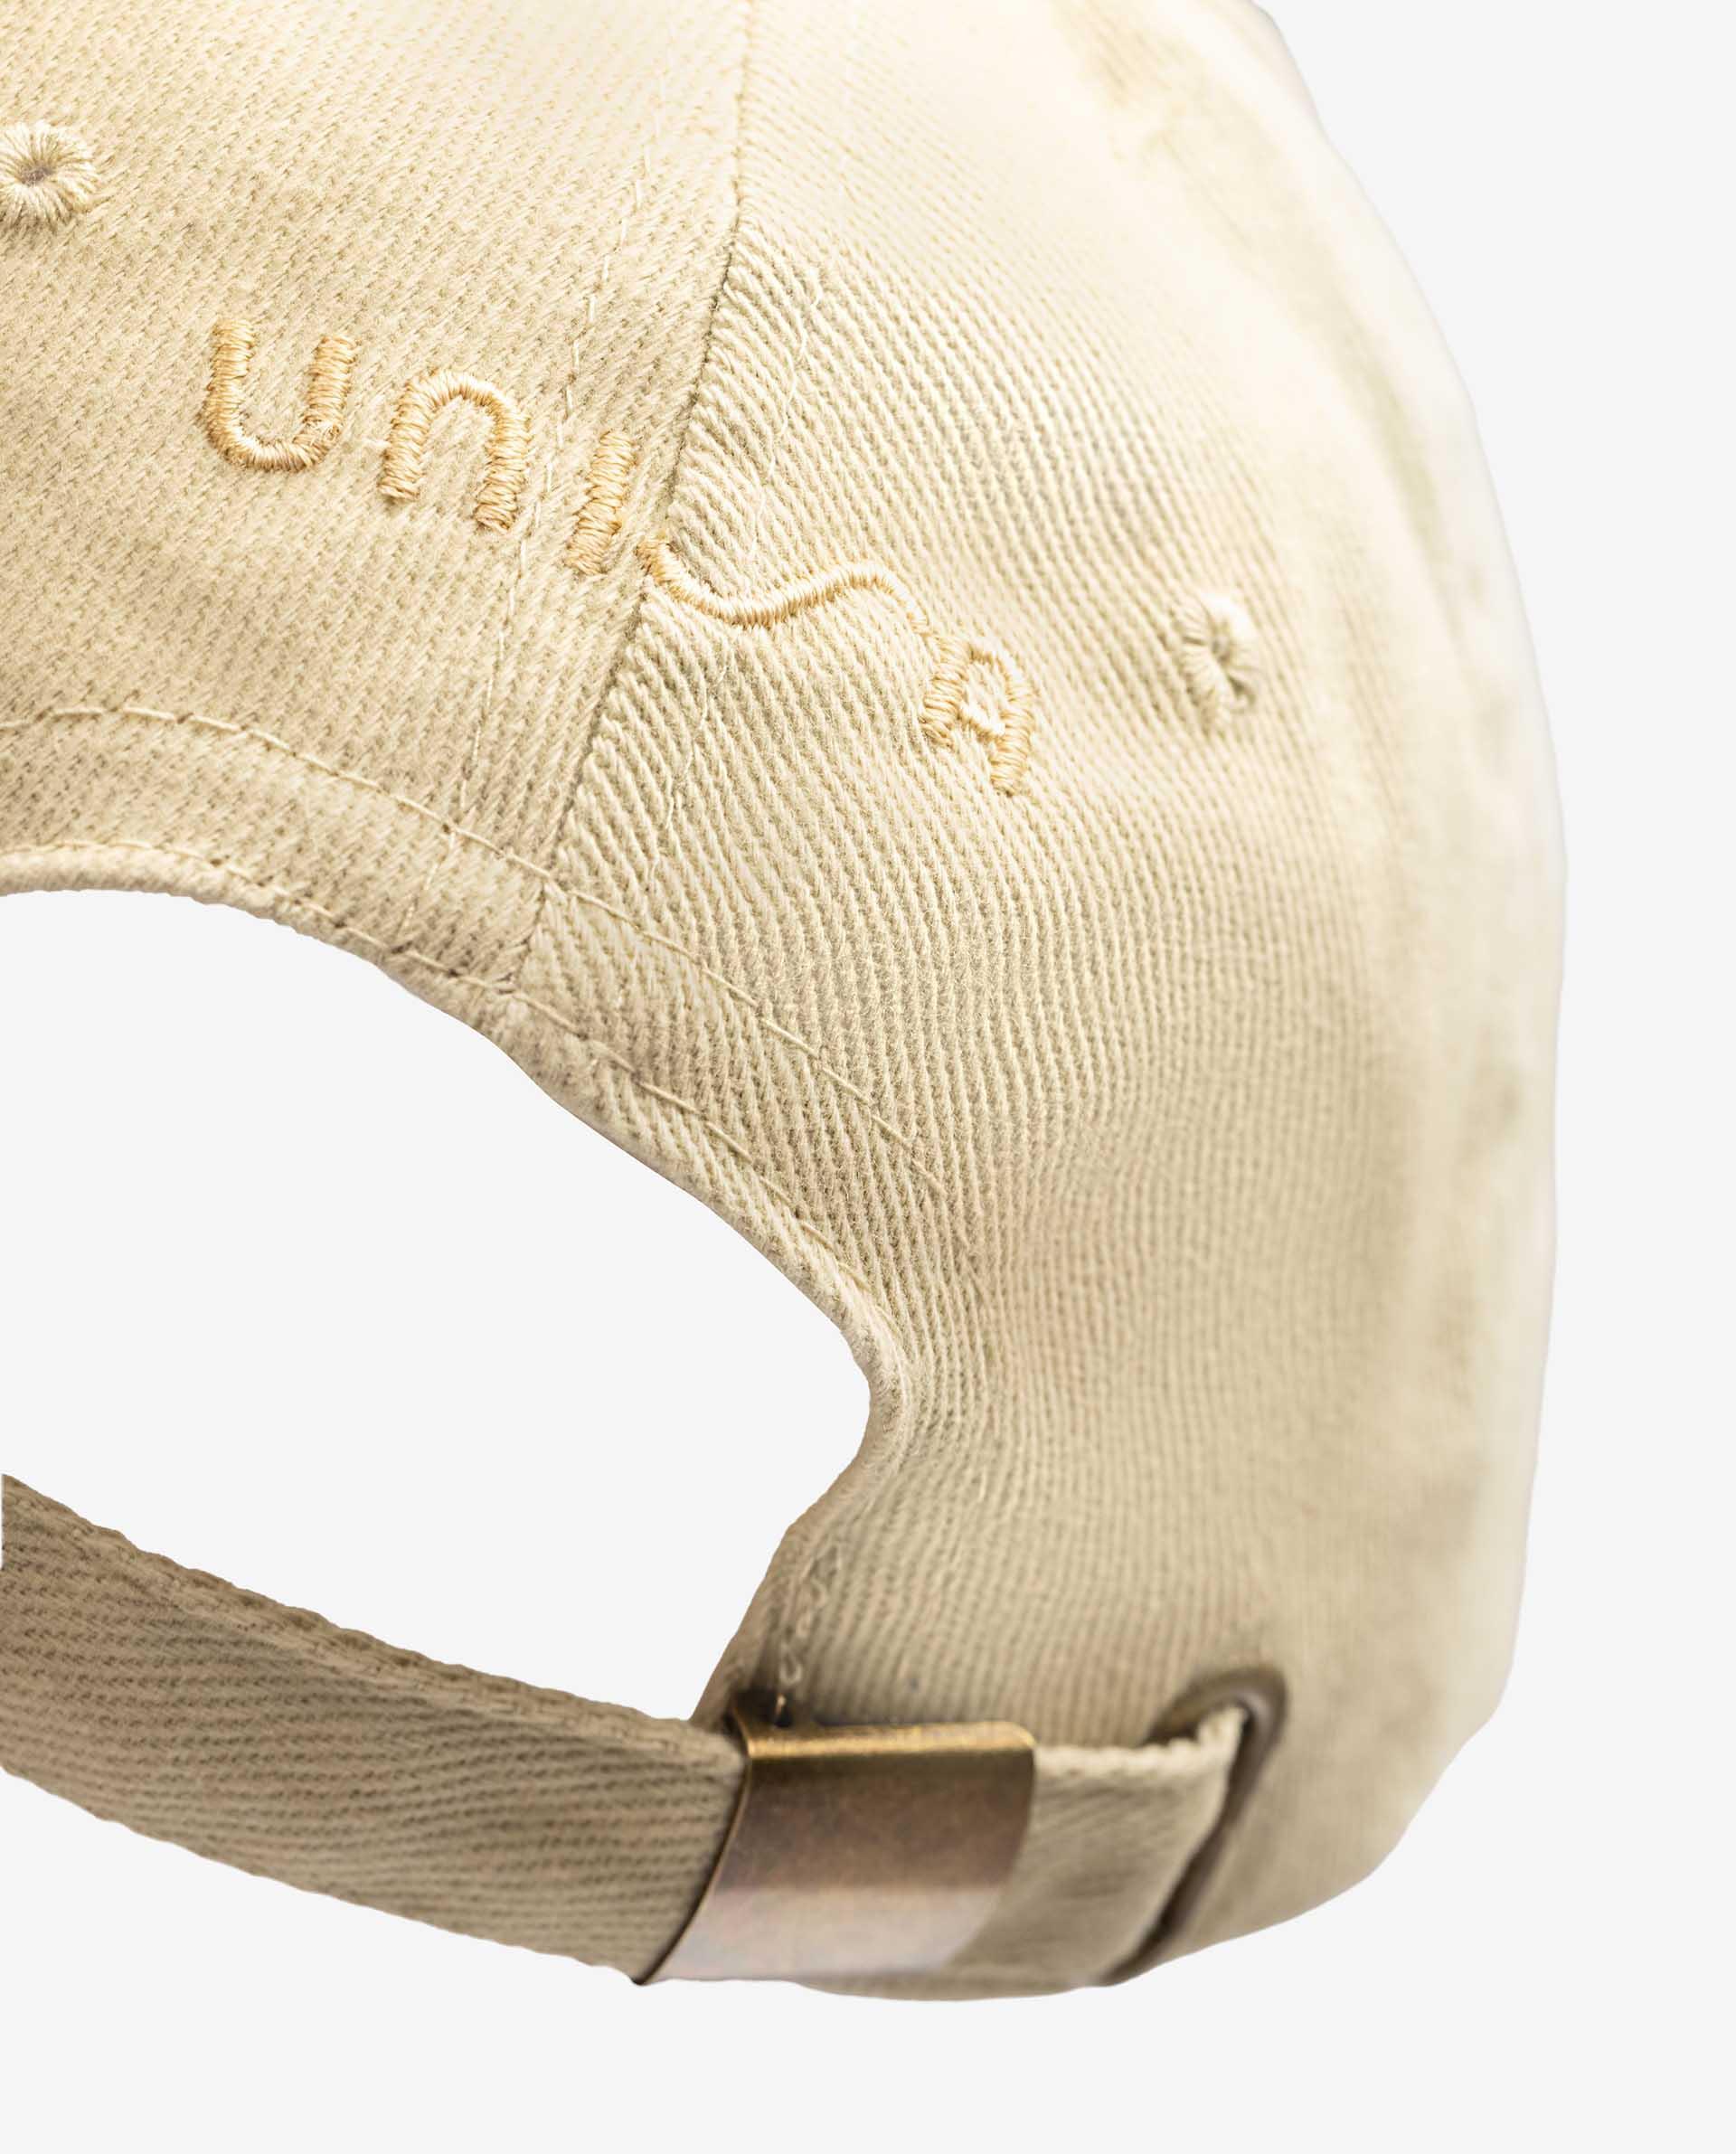 Unisa Gorras y sombreros GORRA_UNI beige 3